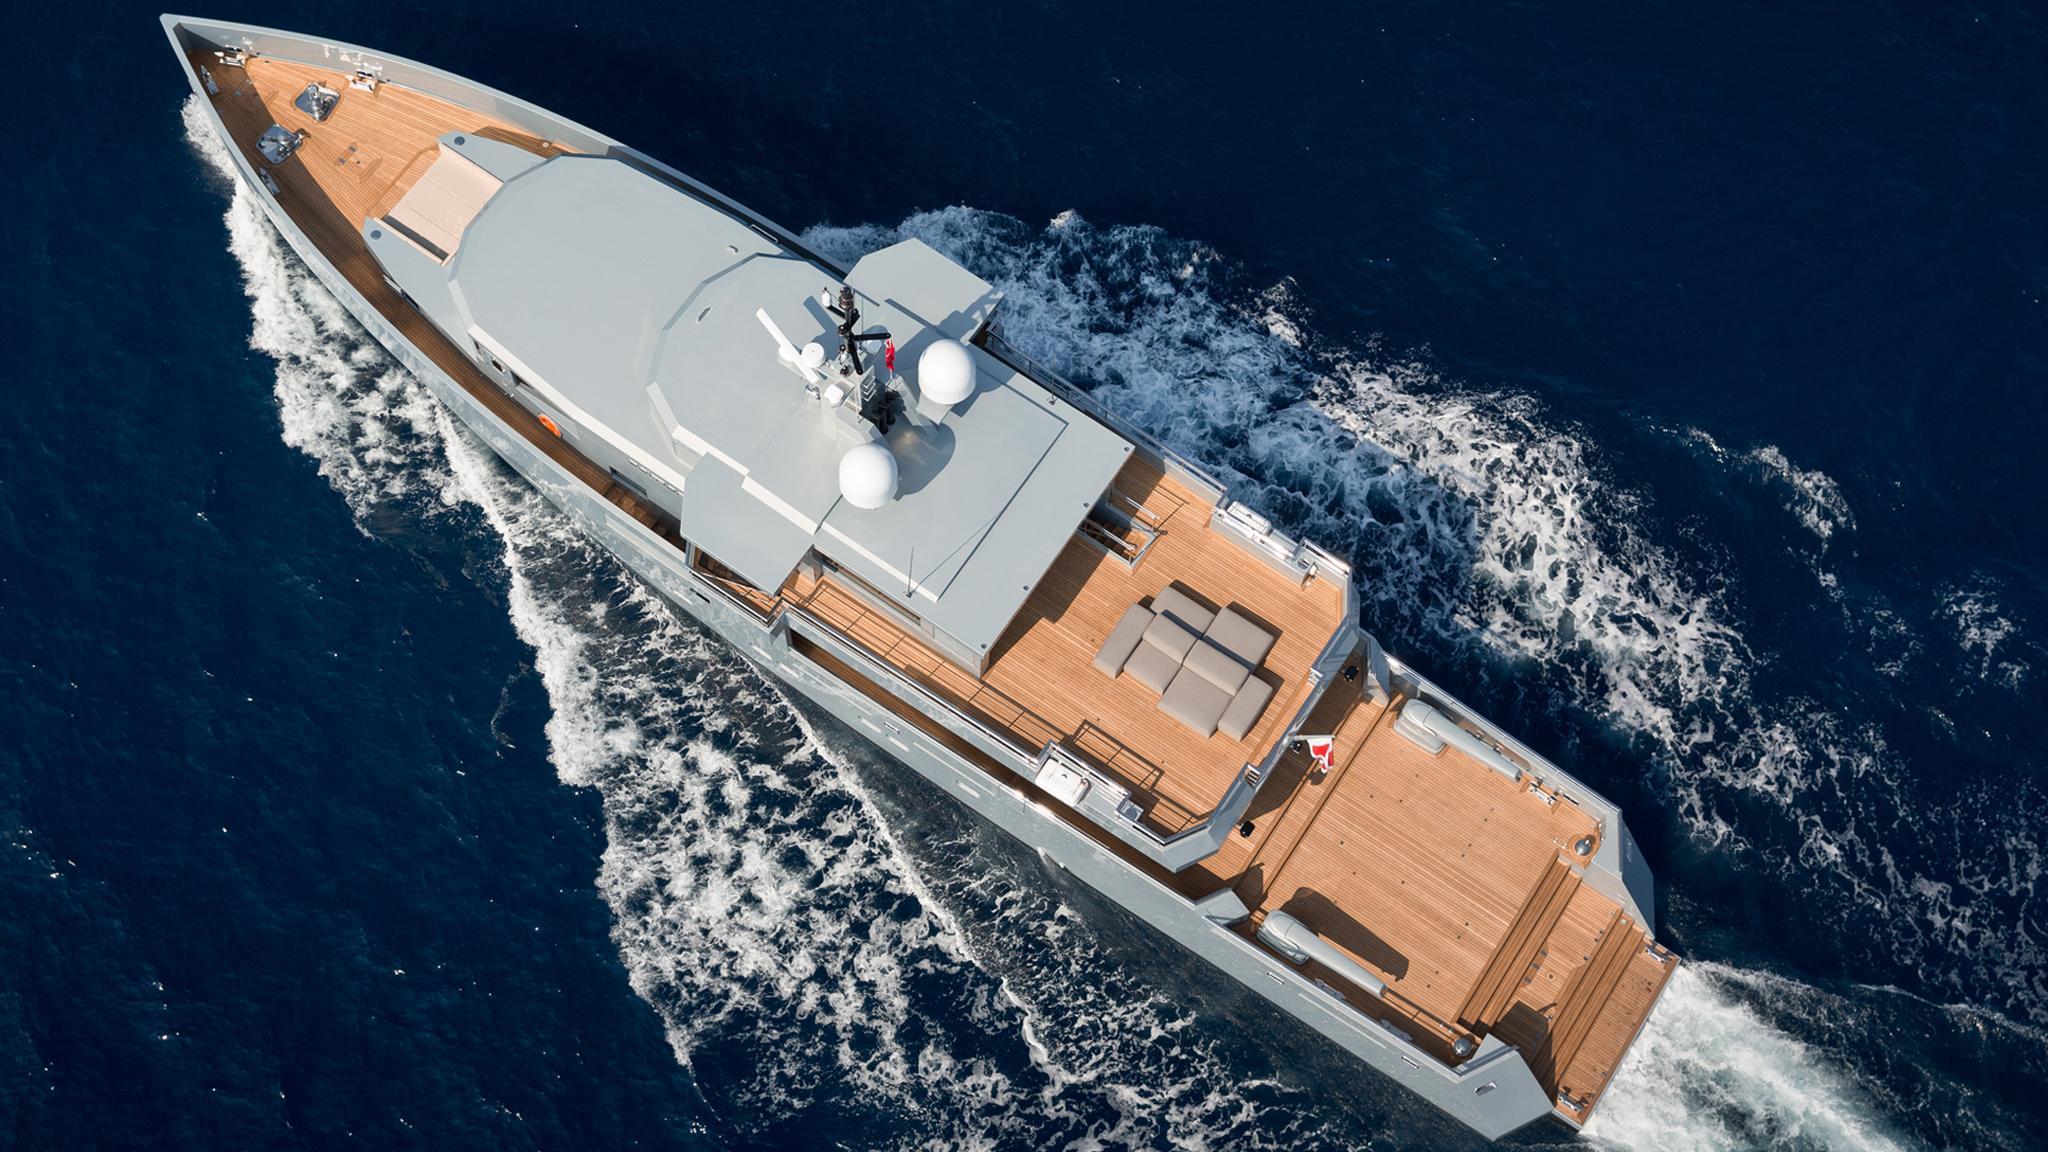 so-mar-motor-yacht-tansu-2014-38m-aerial-cruising